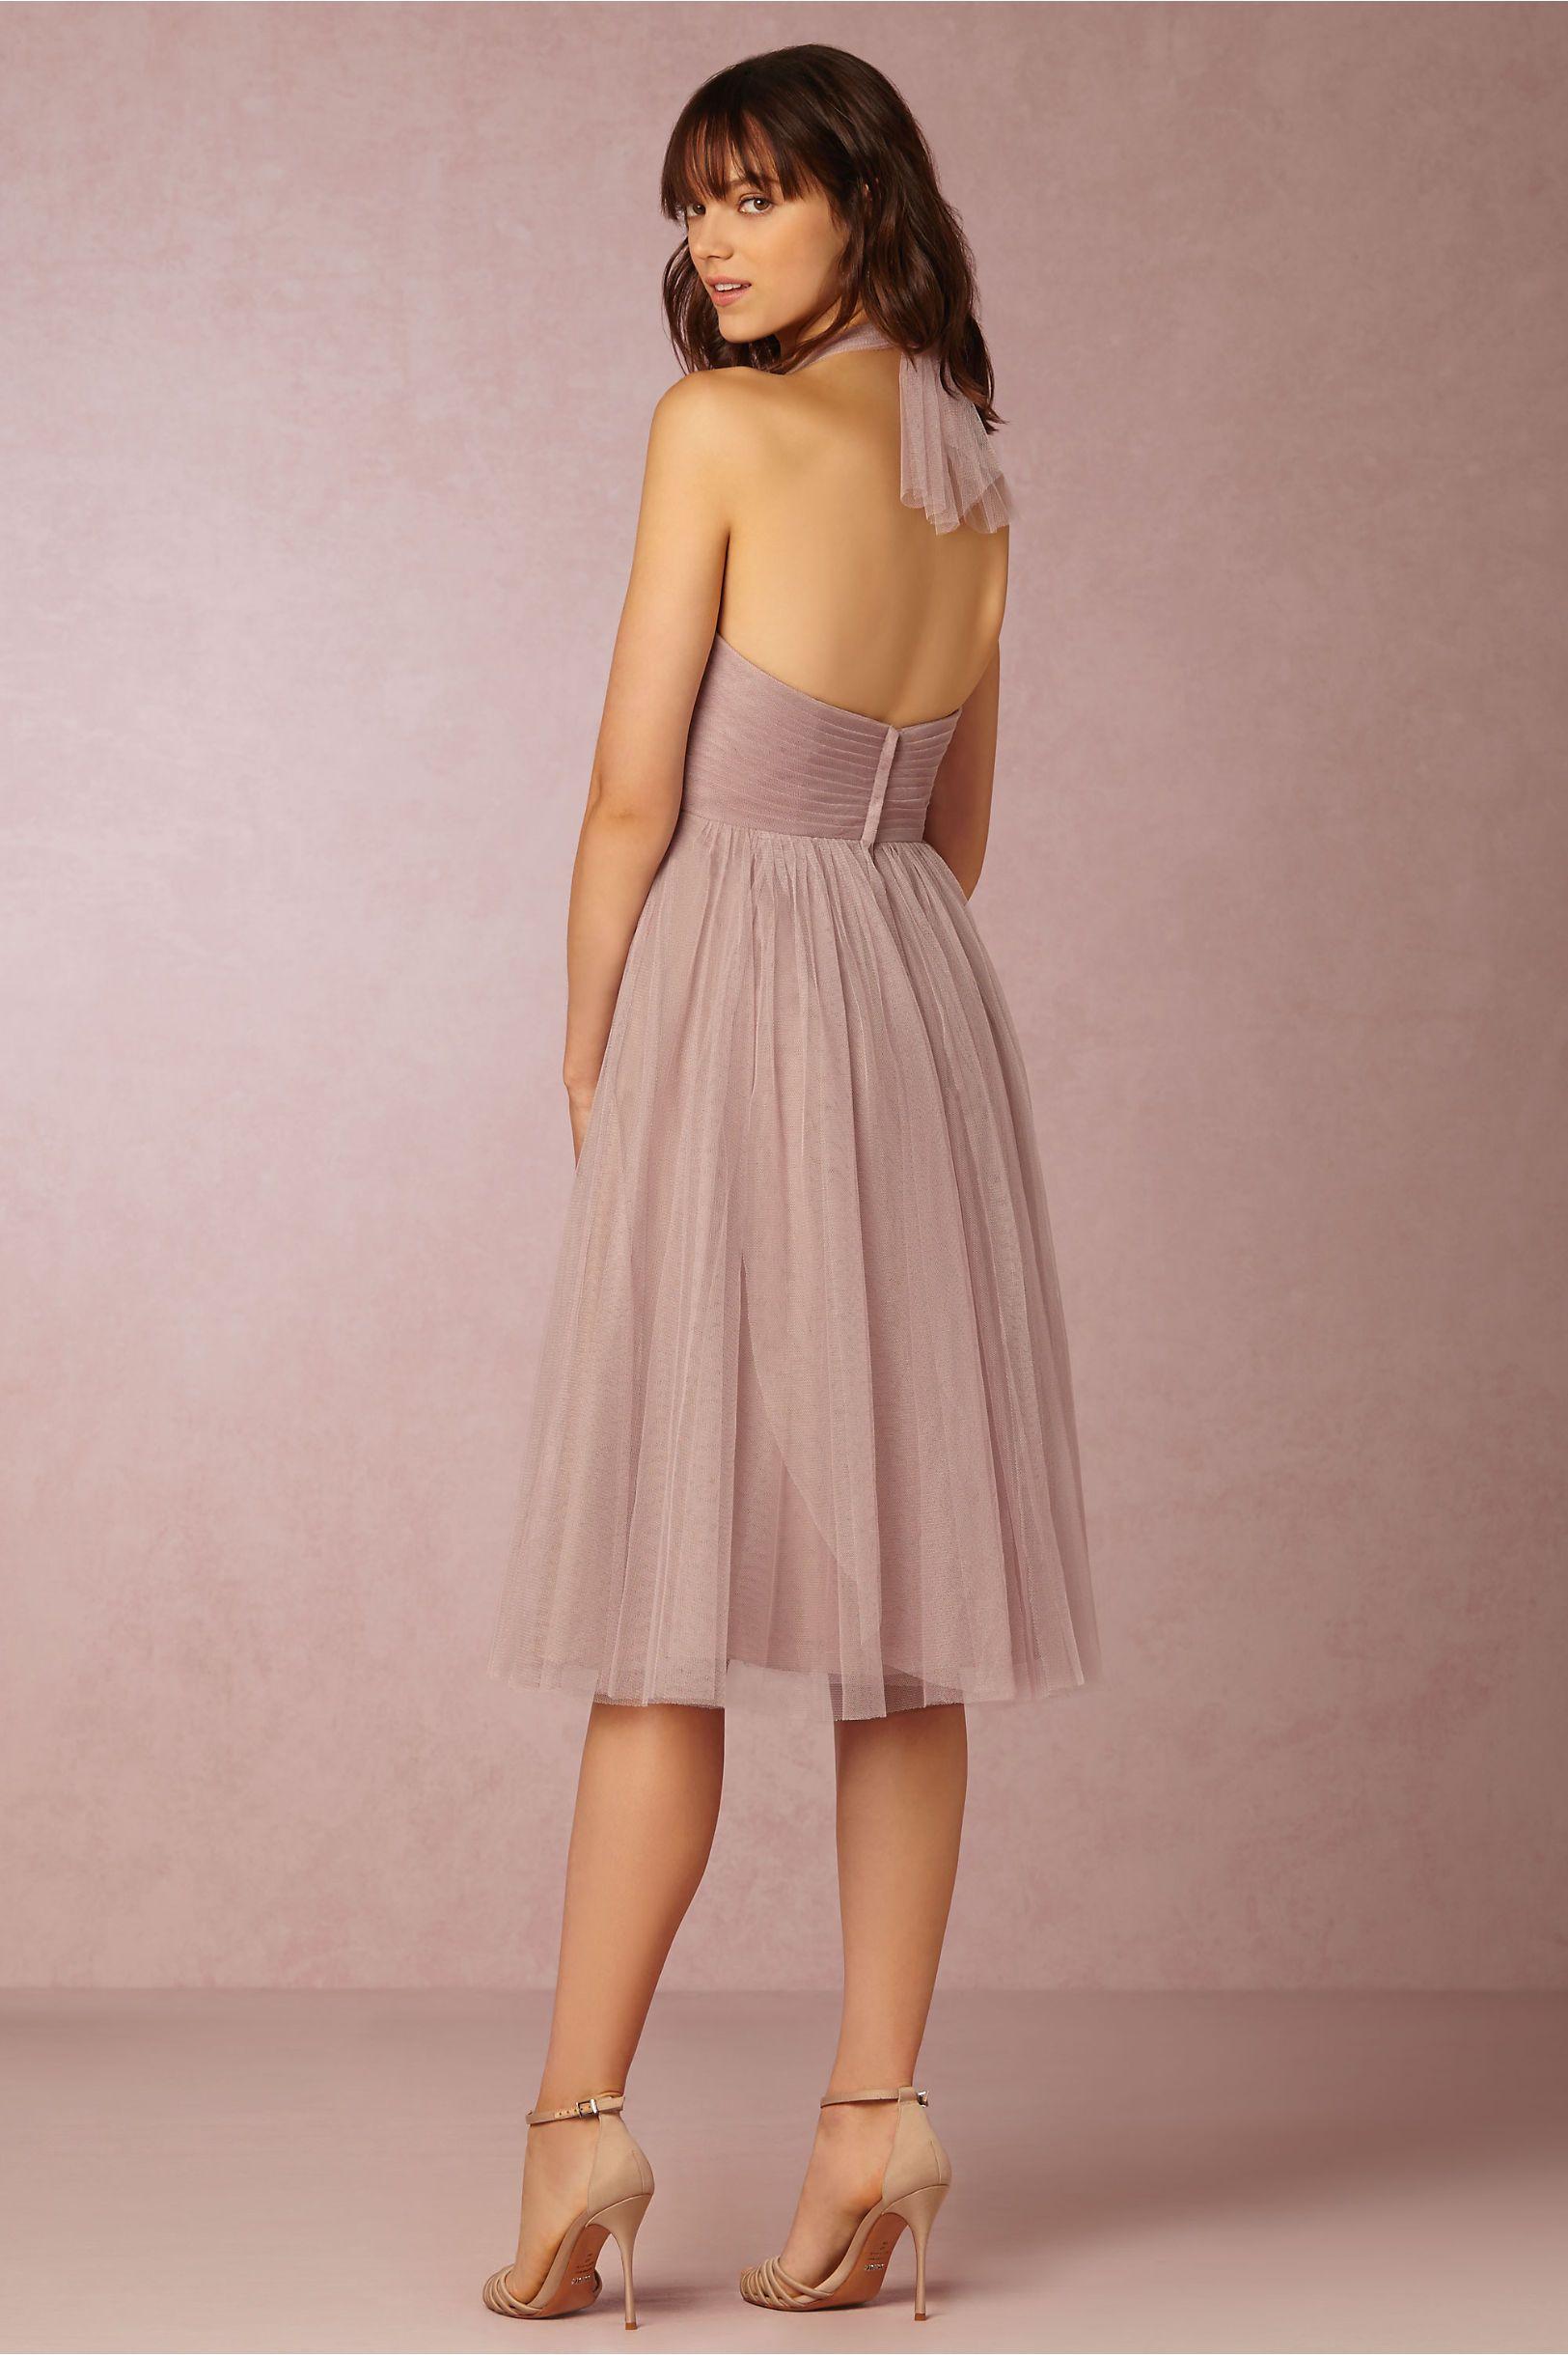 Bhldn maia dress in bridesmaids bridesmaid dresses at bhldn beauty